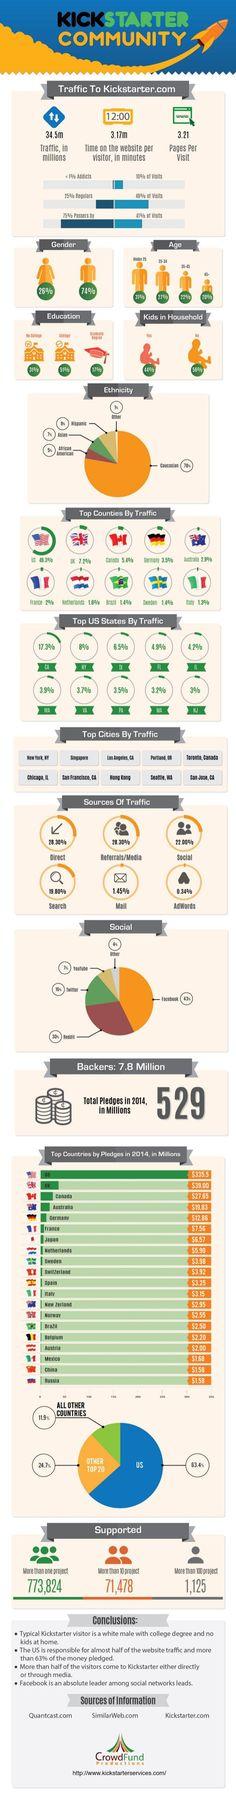 fundraising infographic : KICKSTARTER community #INFOGRAPHIC #ENTREPRENEURSHIP #CROWDFUNDING